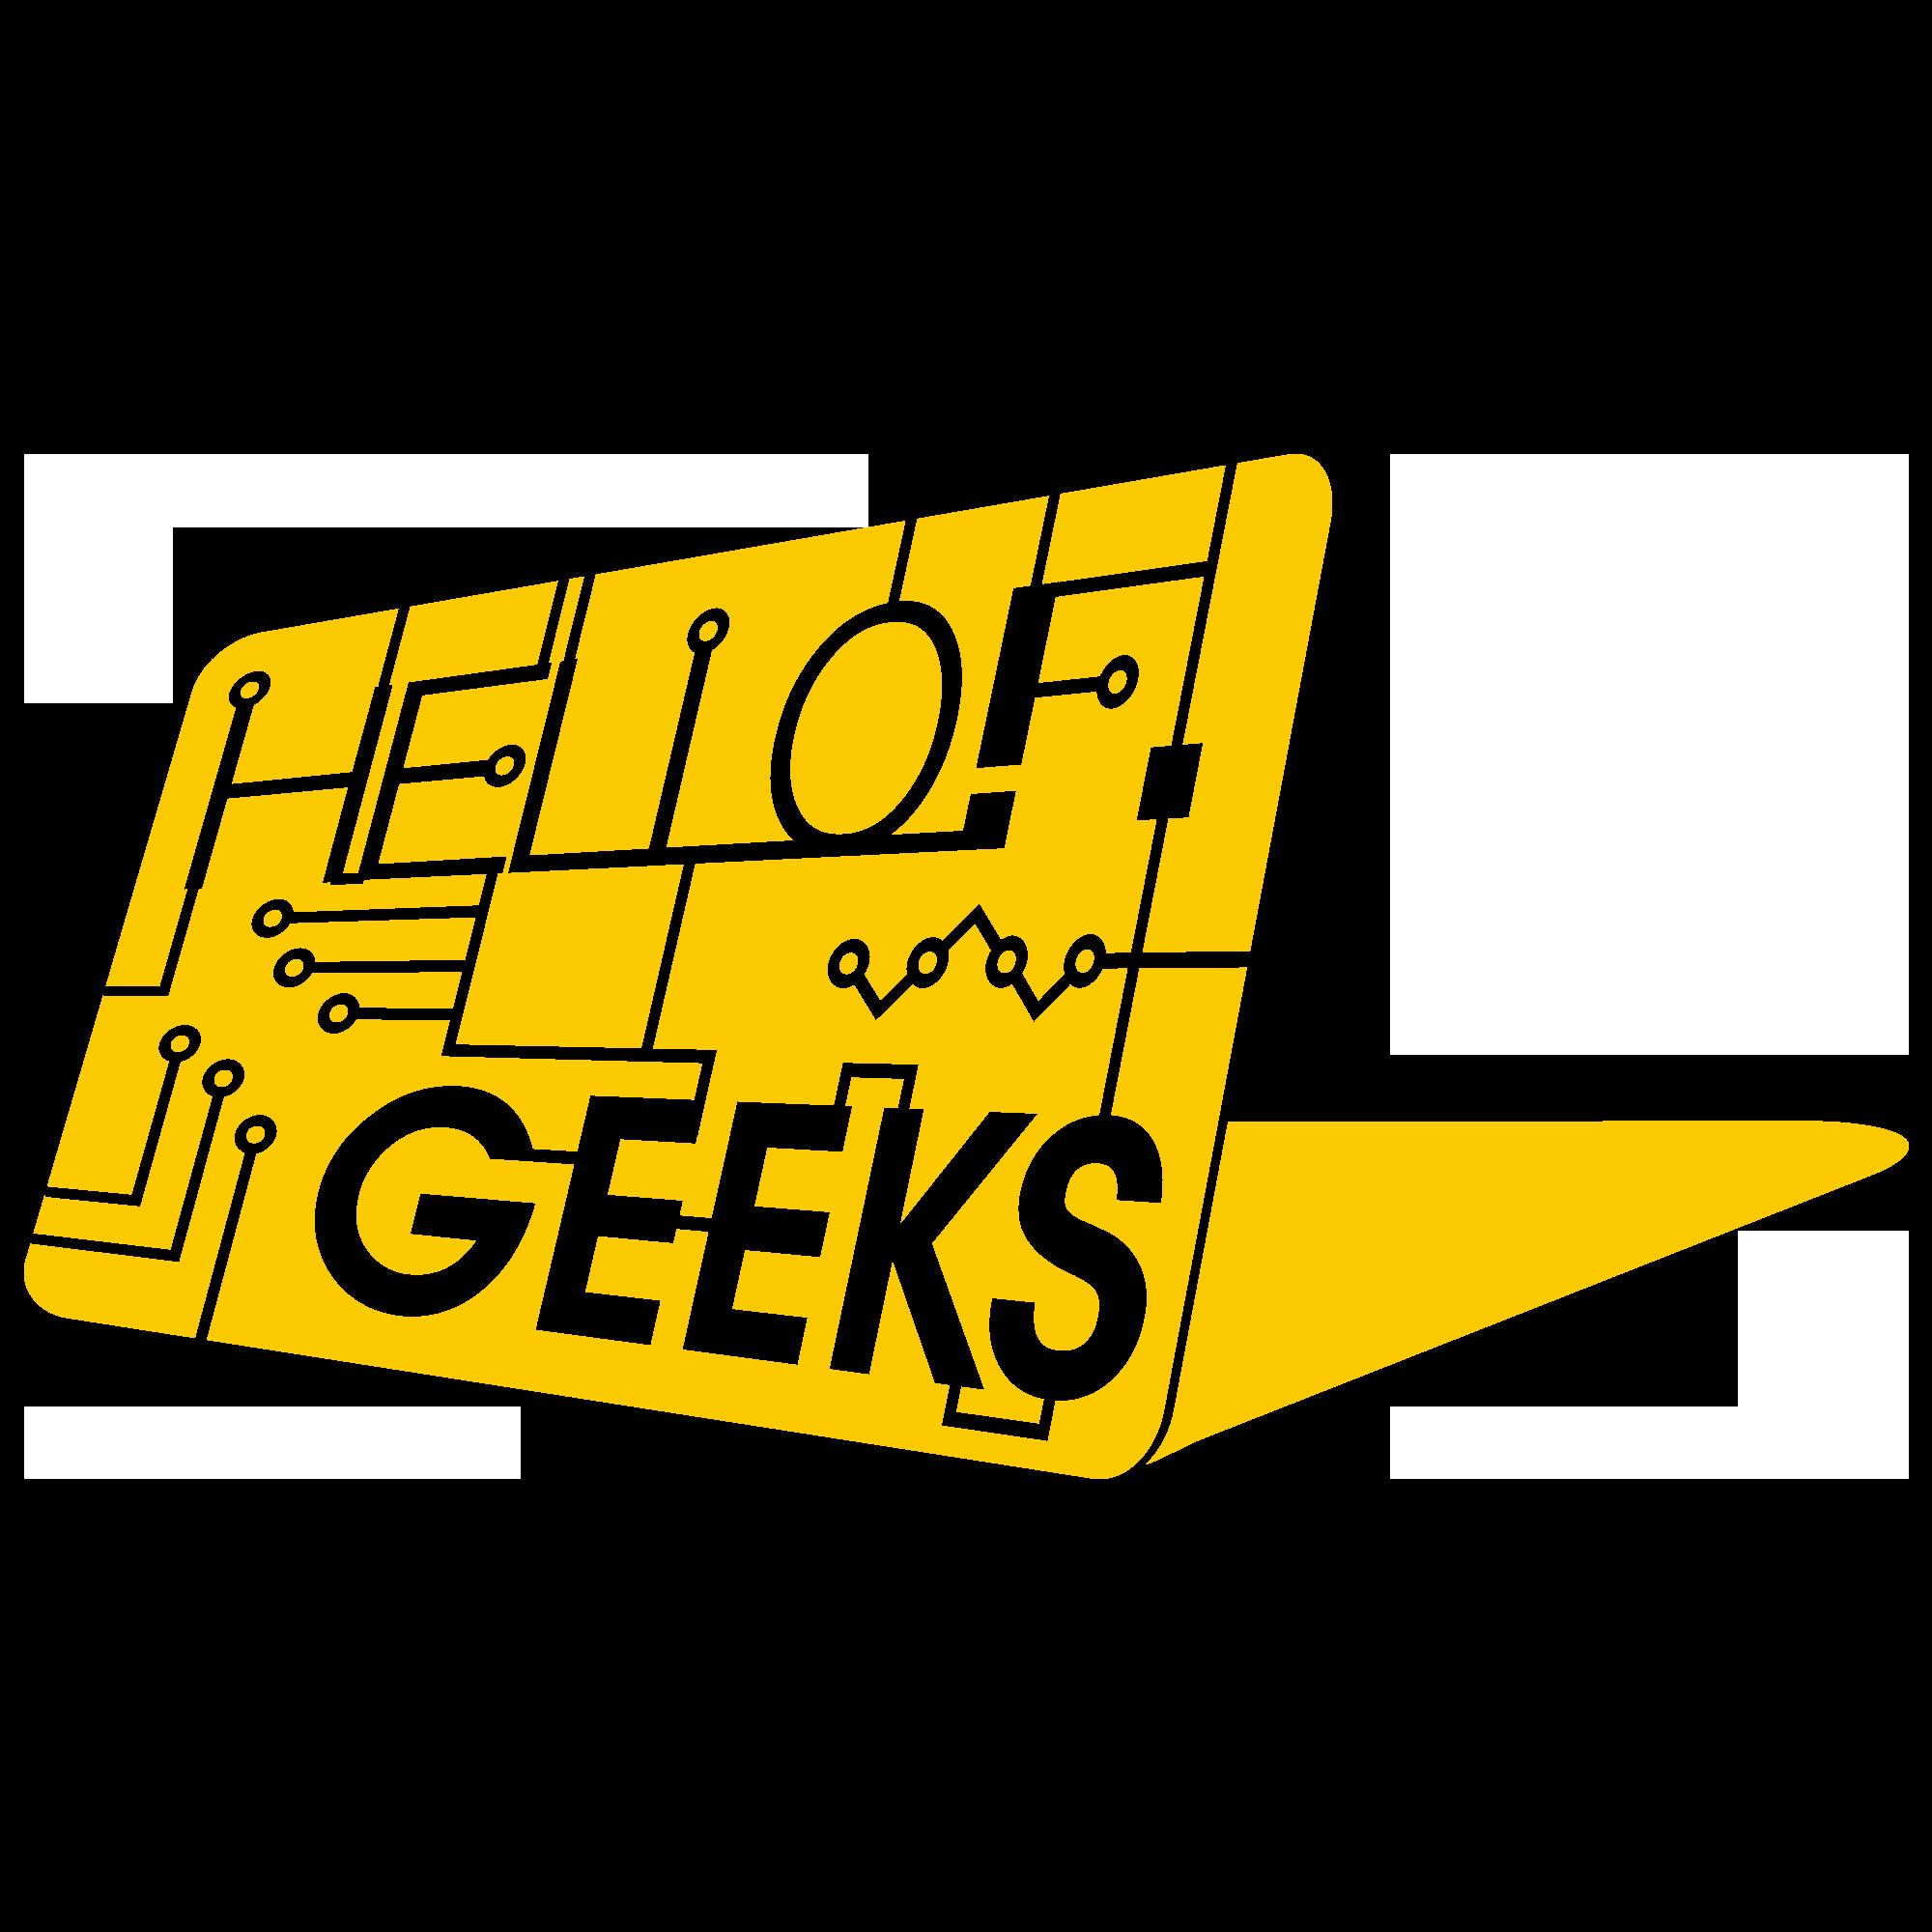 HelloGeeks